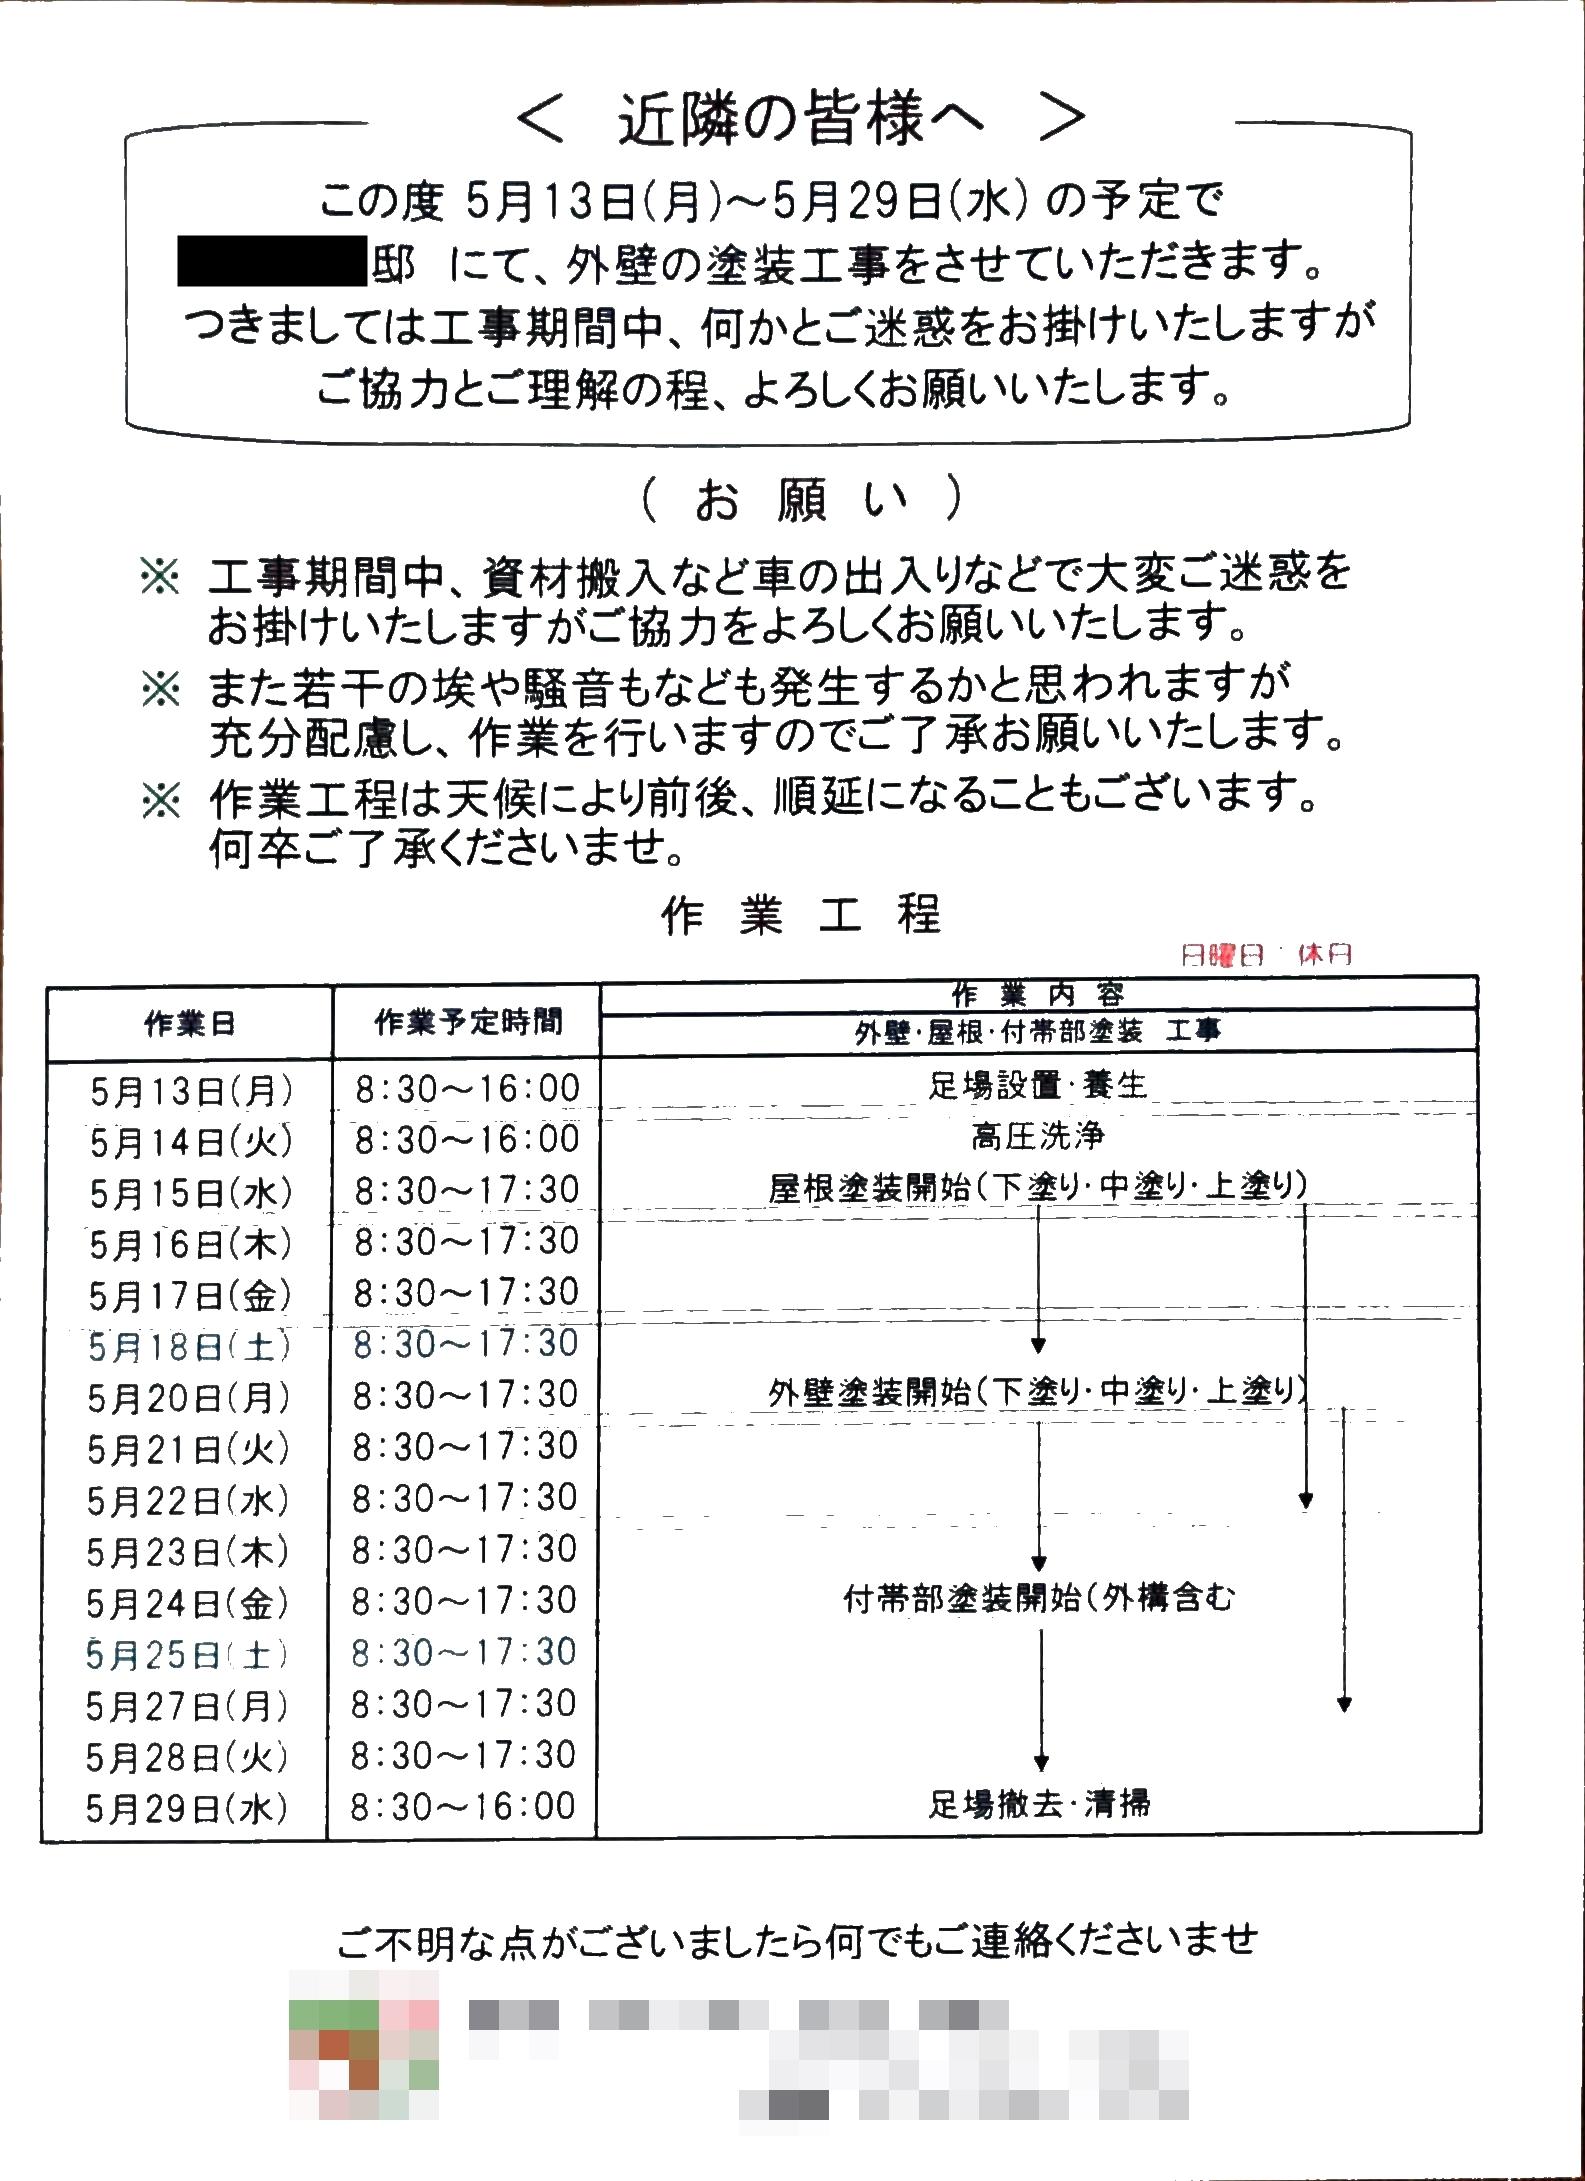 2019_05_10 18_42 Office Lensm